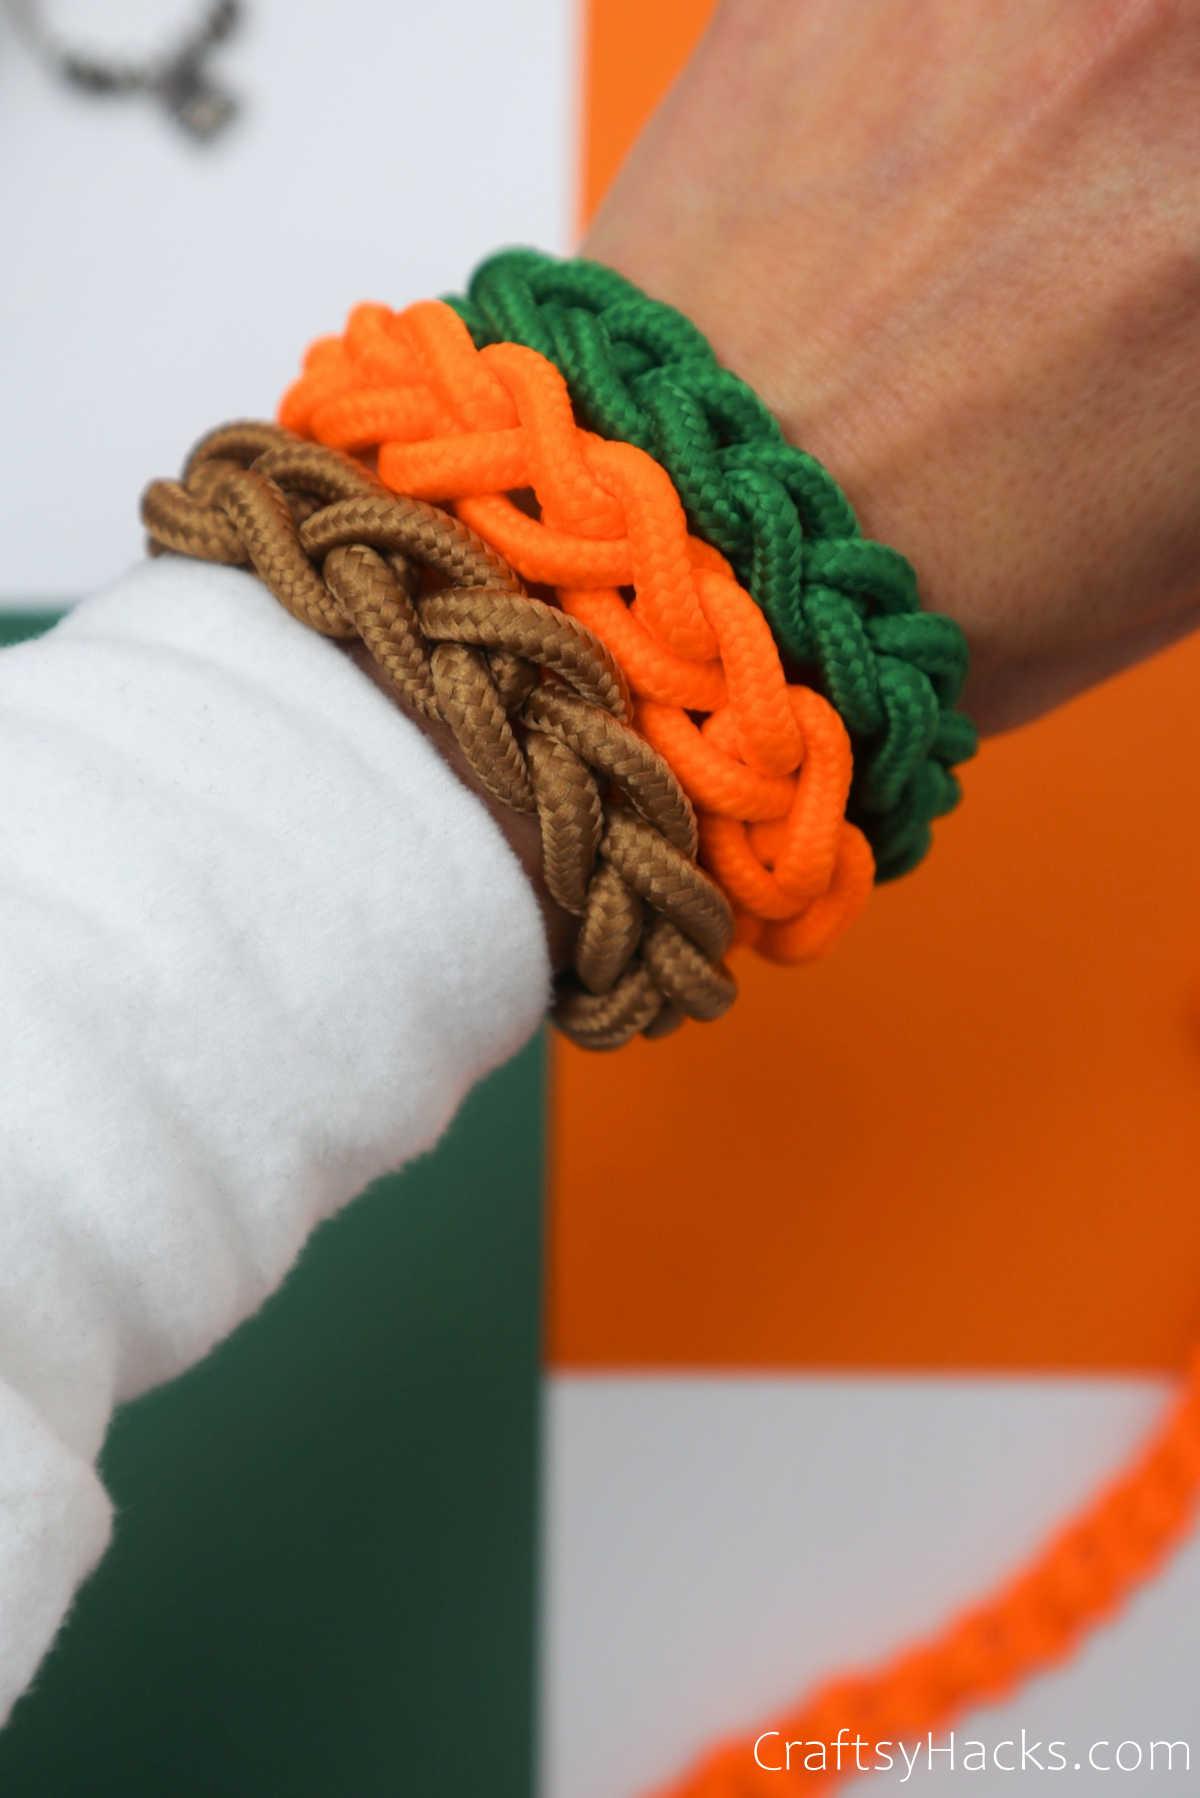 green, orange, and brown DIY bracelets on wrist